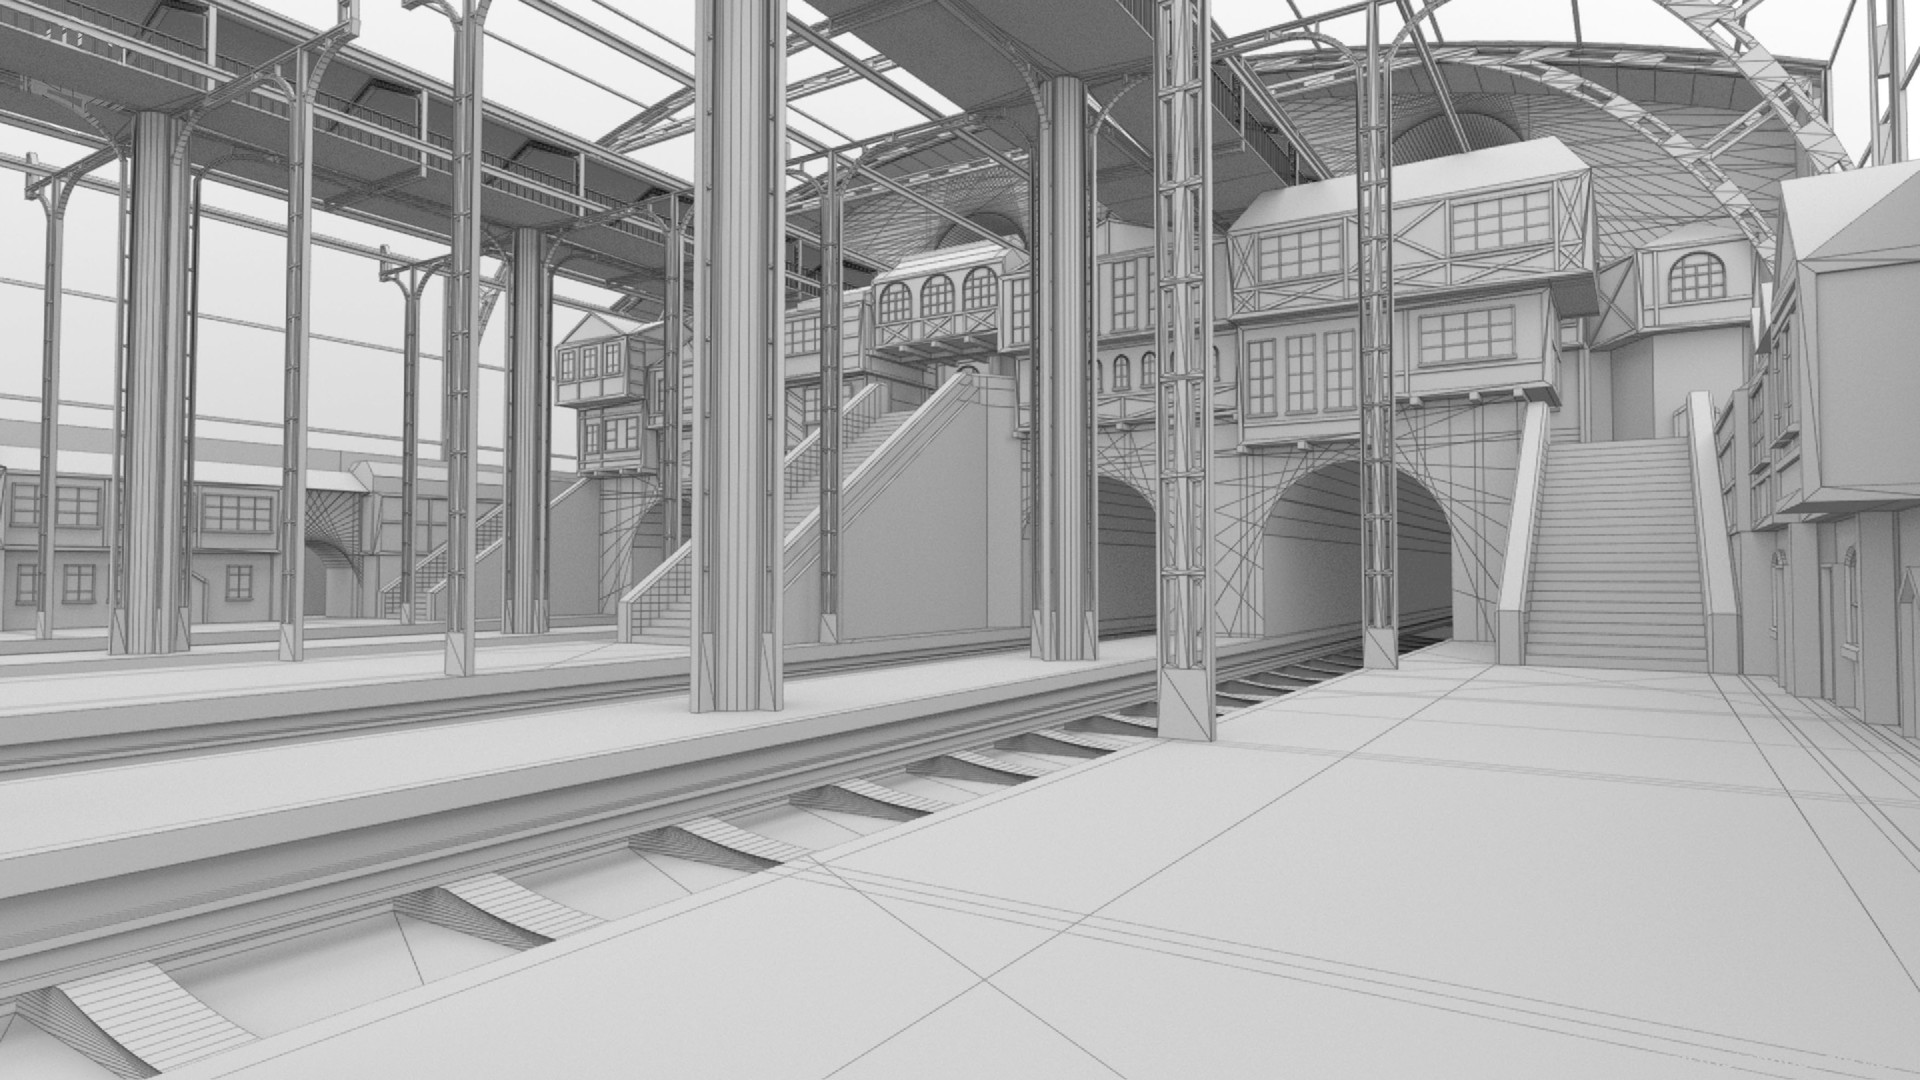 Triston beadle train station 02 wire frame